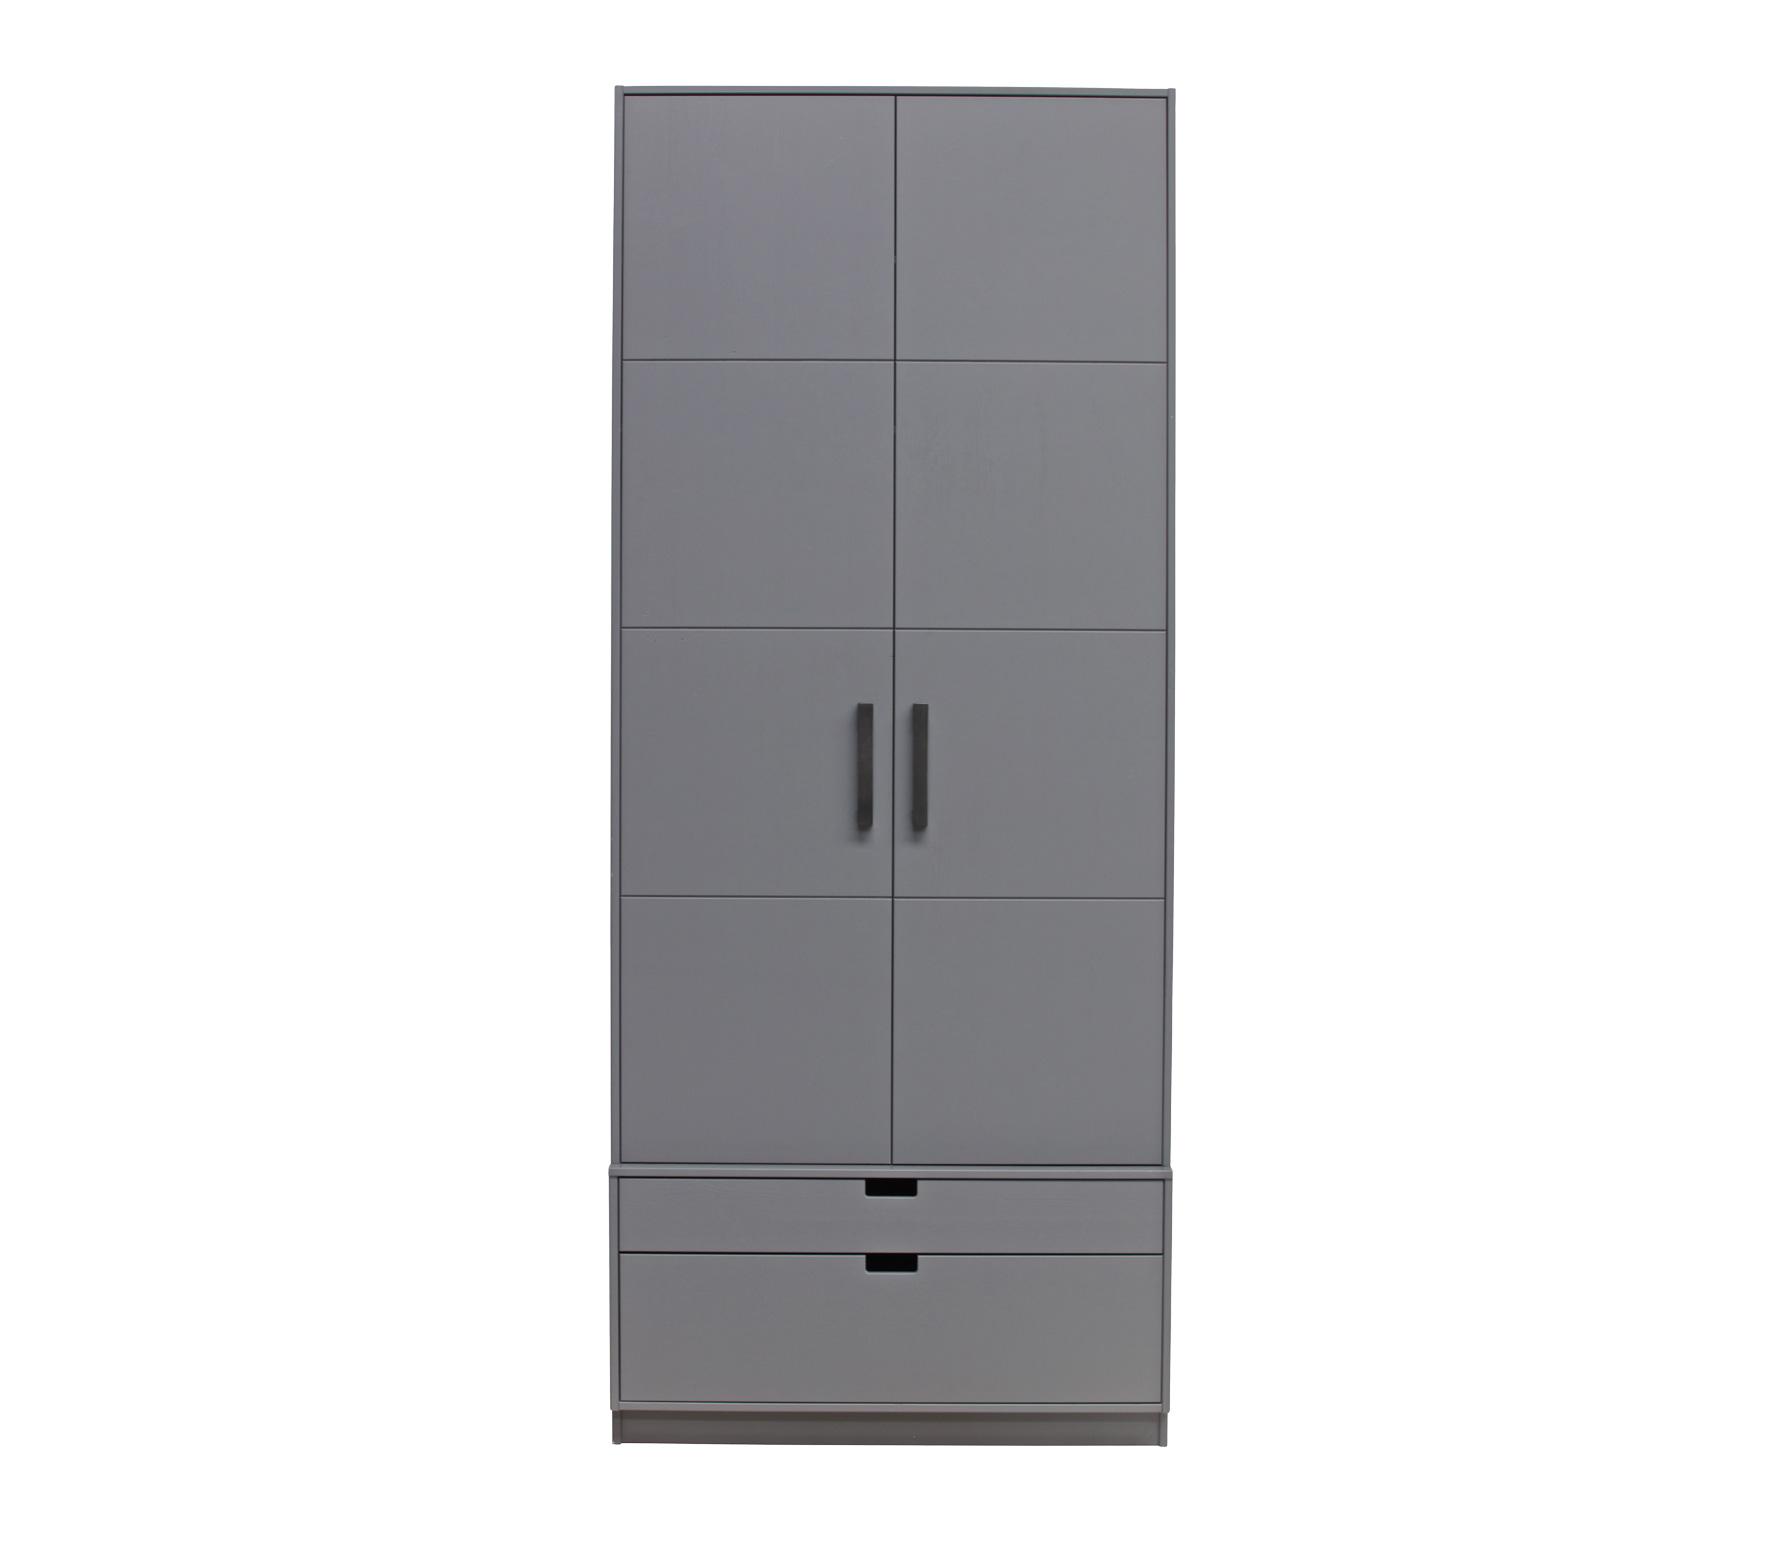 Basiclabel SKIK kast variant 16 231x95x62 cm grenen leem